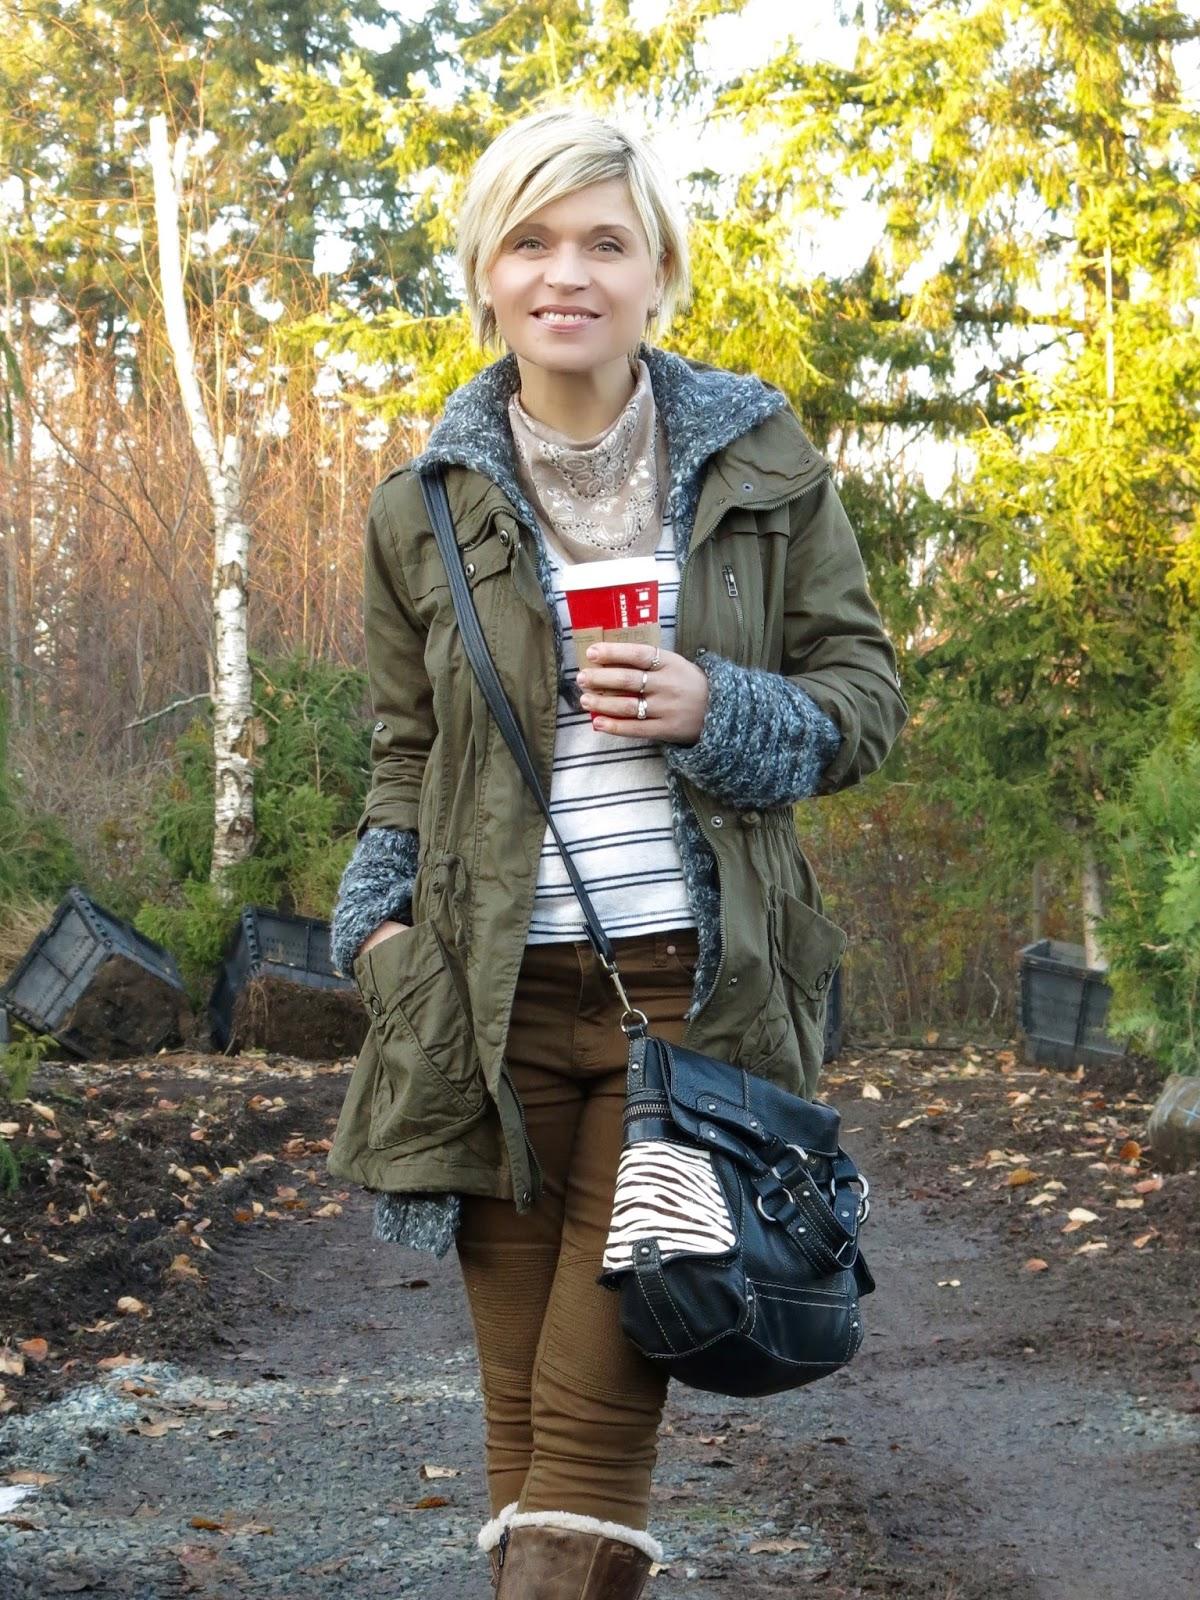 khaki skinnies, striped tee, neckerchief, and layered jackets